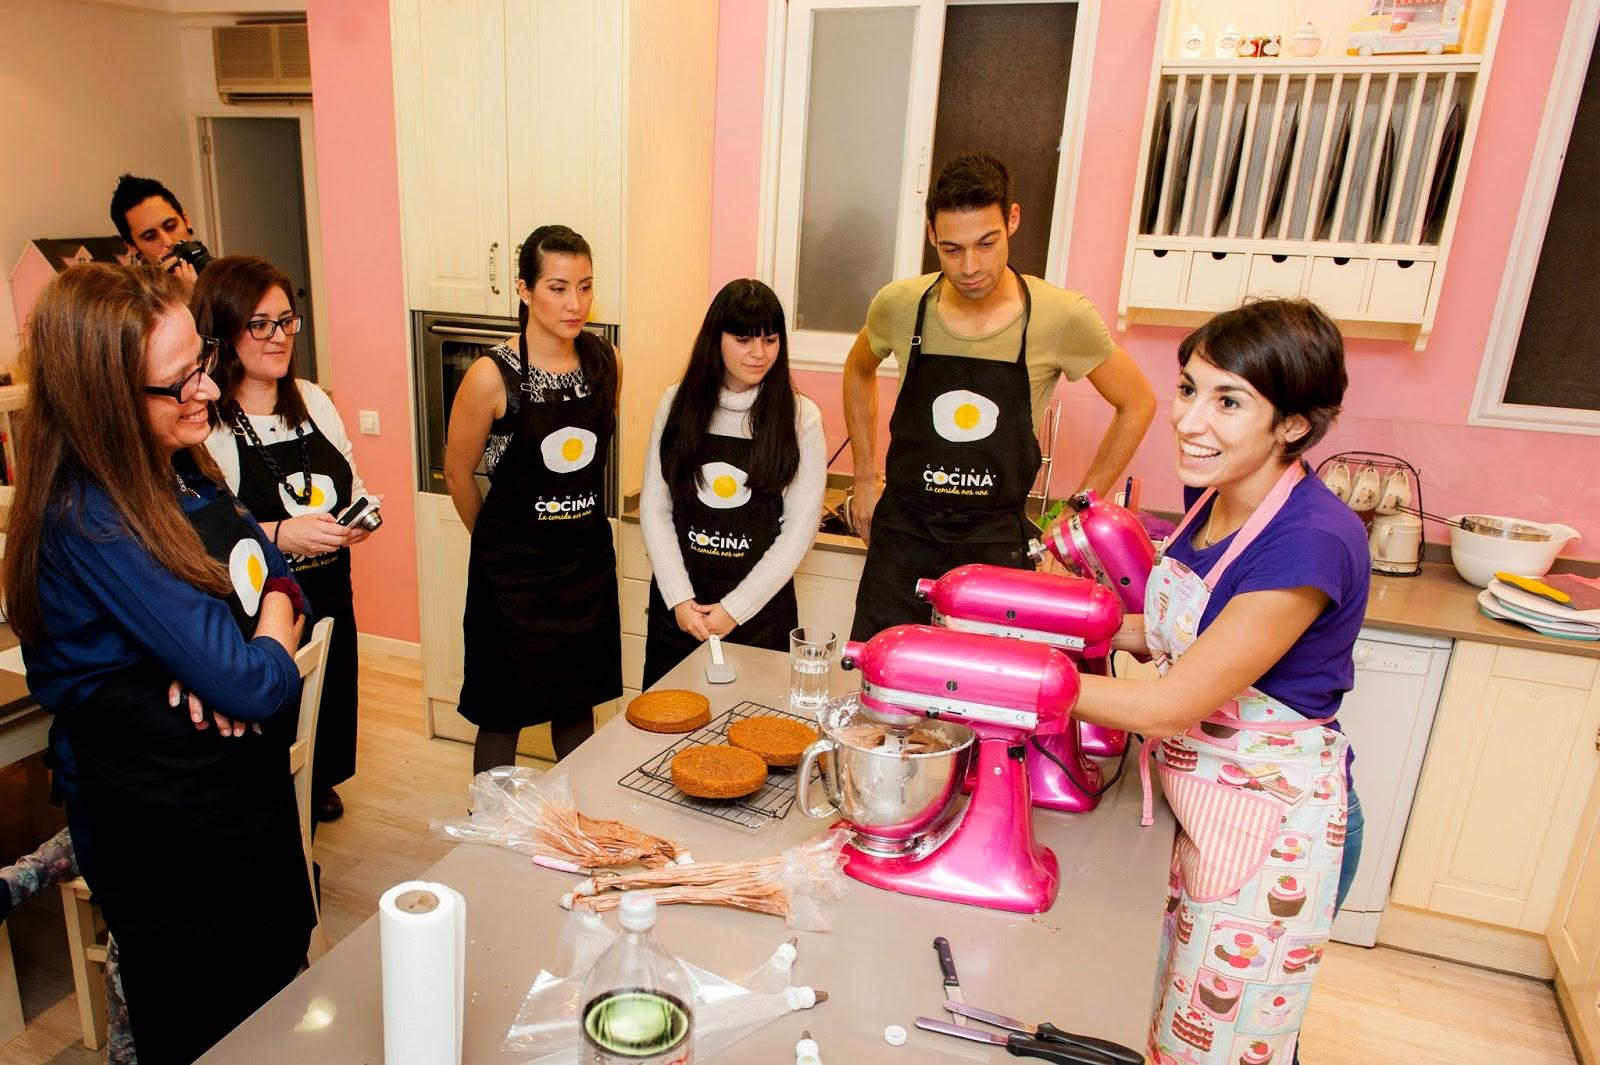 Curso de Layer Cake con Alma Obregón y Canal Cocina